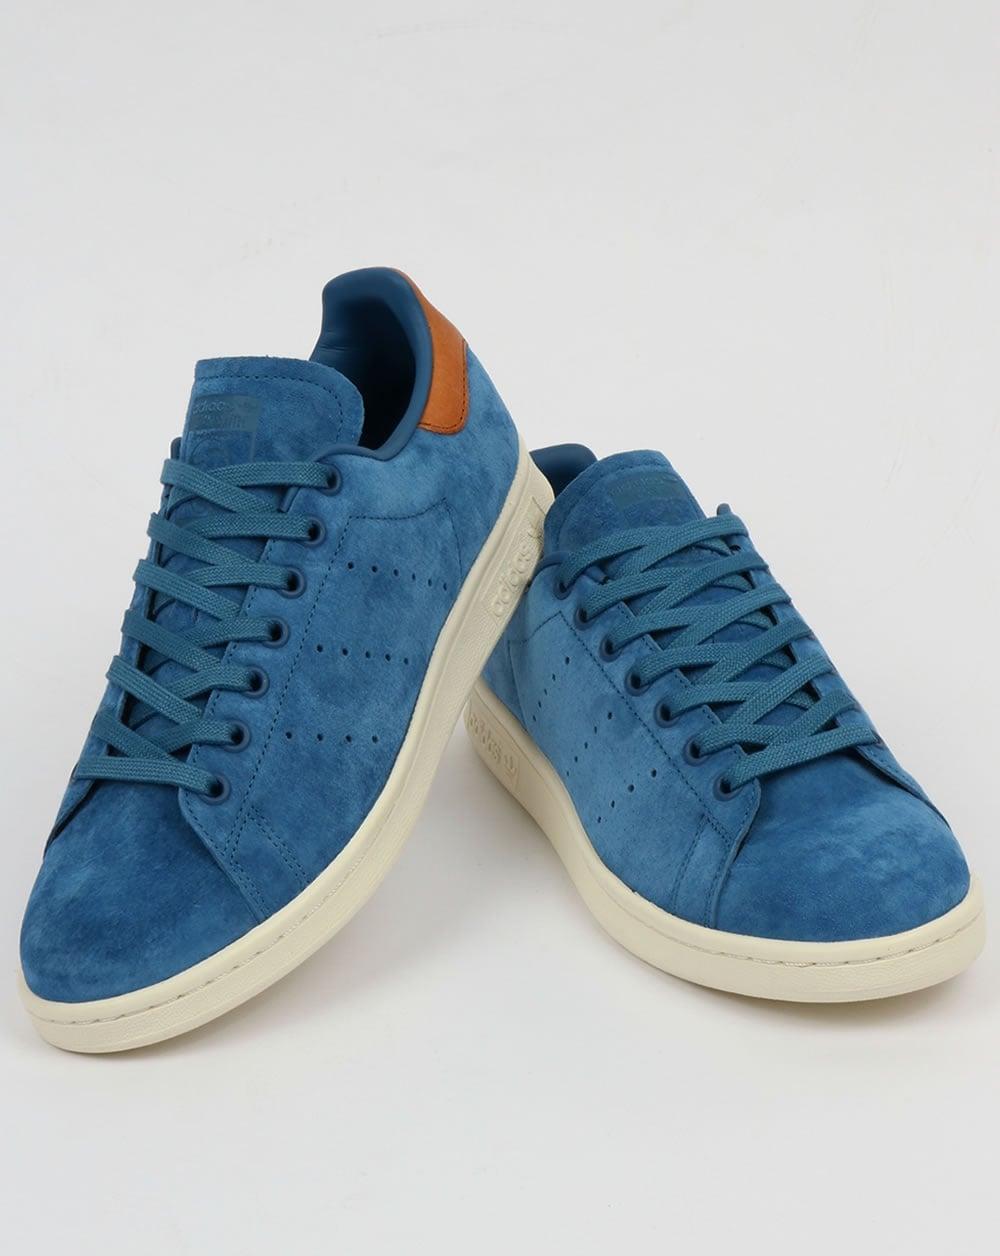 the best attitude 133b6 374d8 Adidas Originals Stan Smith Trainers Core Blue